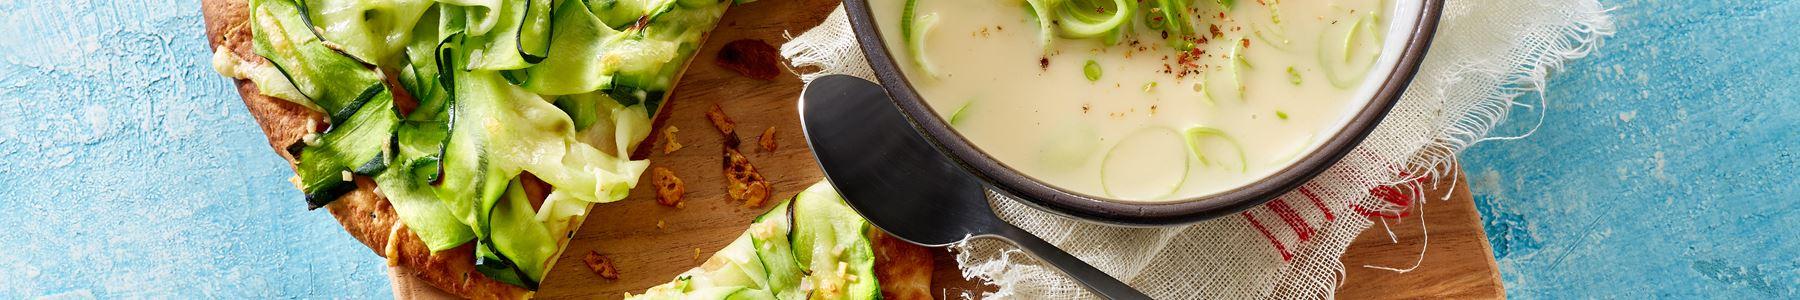 Squash + Varme supper